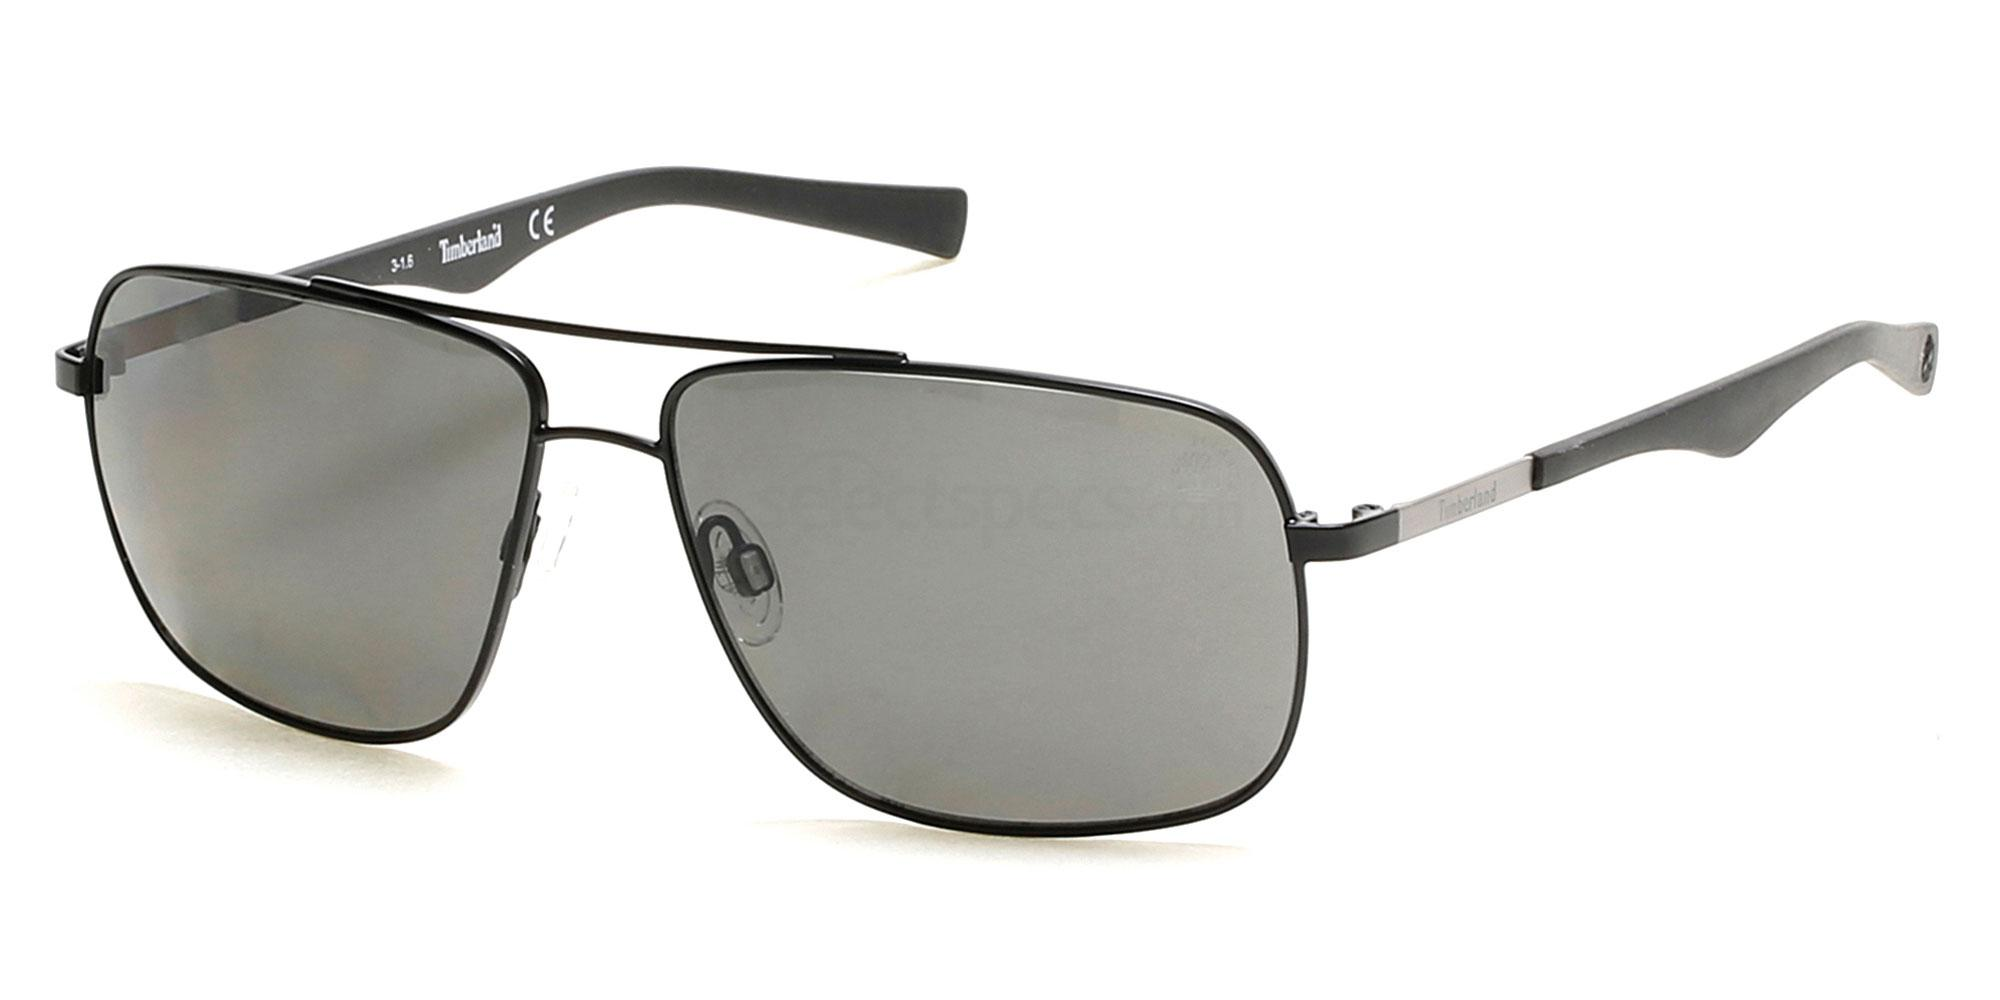 02D TB9107 Sunglasses, Timberland